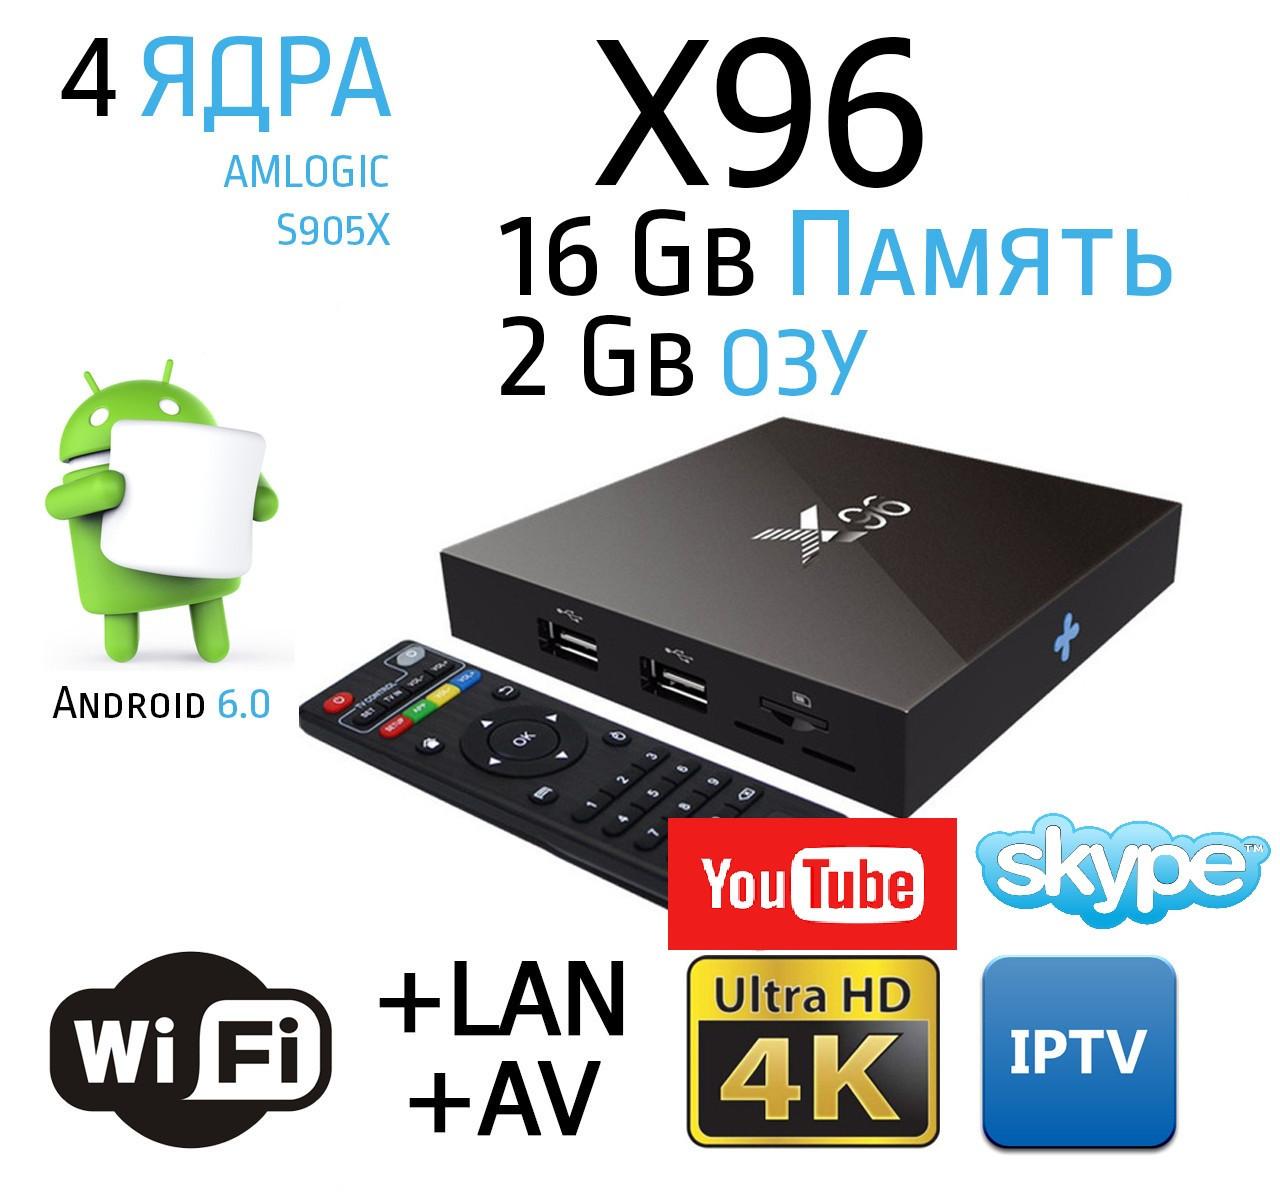 Смарт Приставка Smart TV Смарт ТВ Smart TV Box X96 Android 6.0 UltraHD 4K 2Gb/16Gb